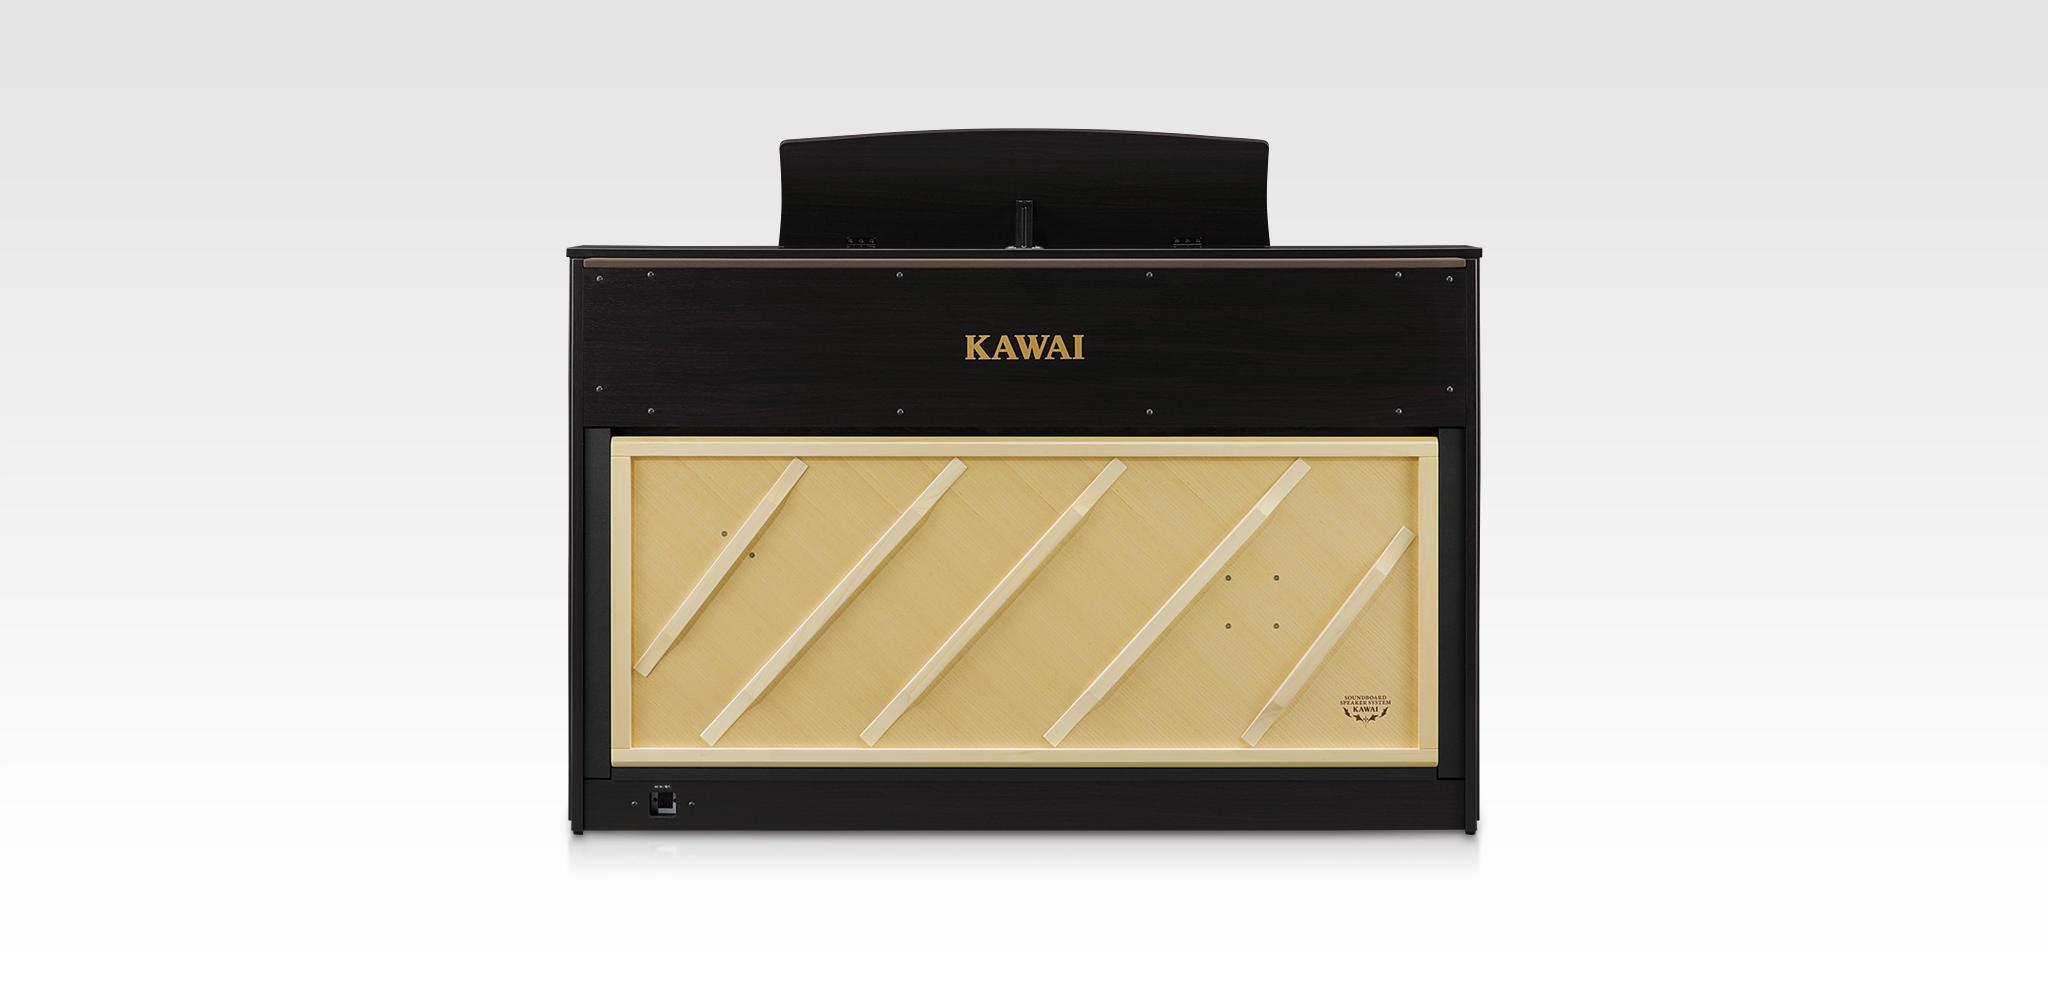 ca98 digital pianos products kawai musical instruments manufacturing co ltd. Black Bedroom Furniture Sets. Home Design Ideas